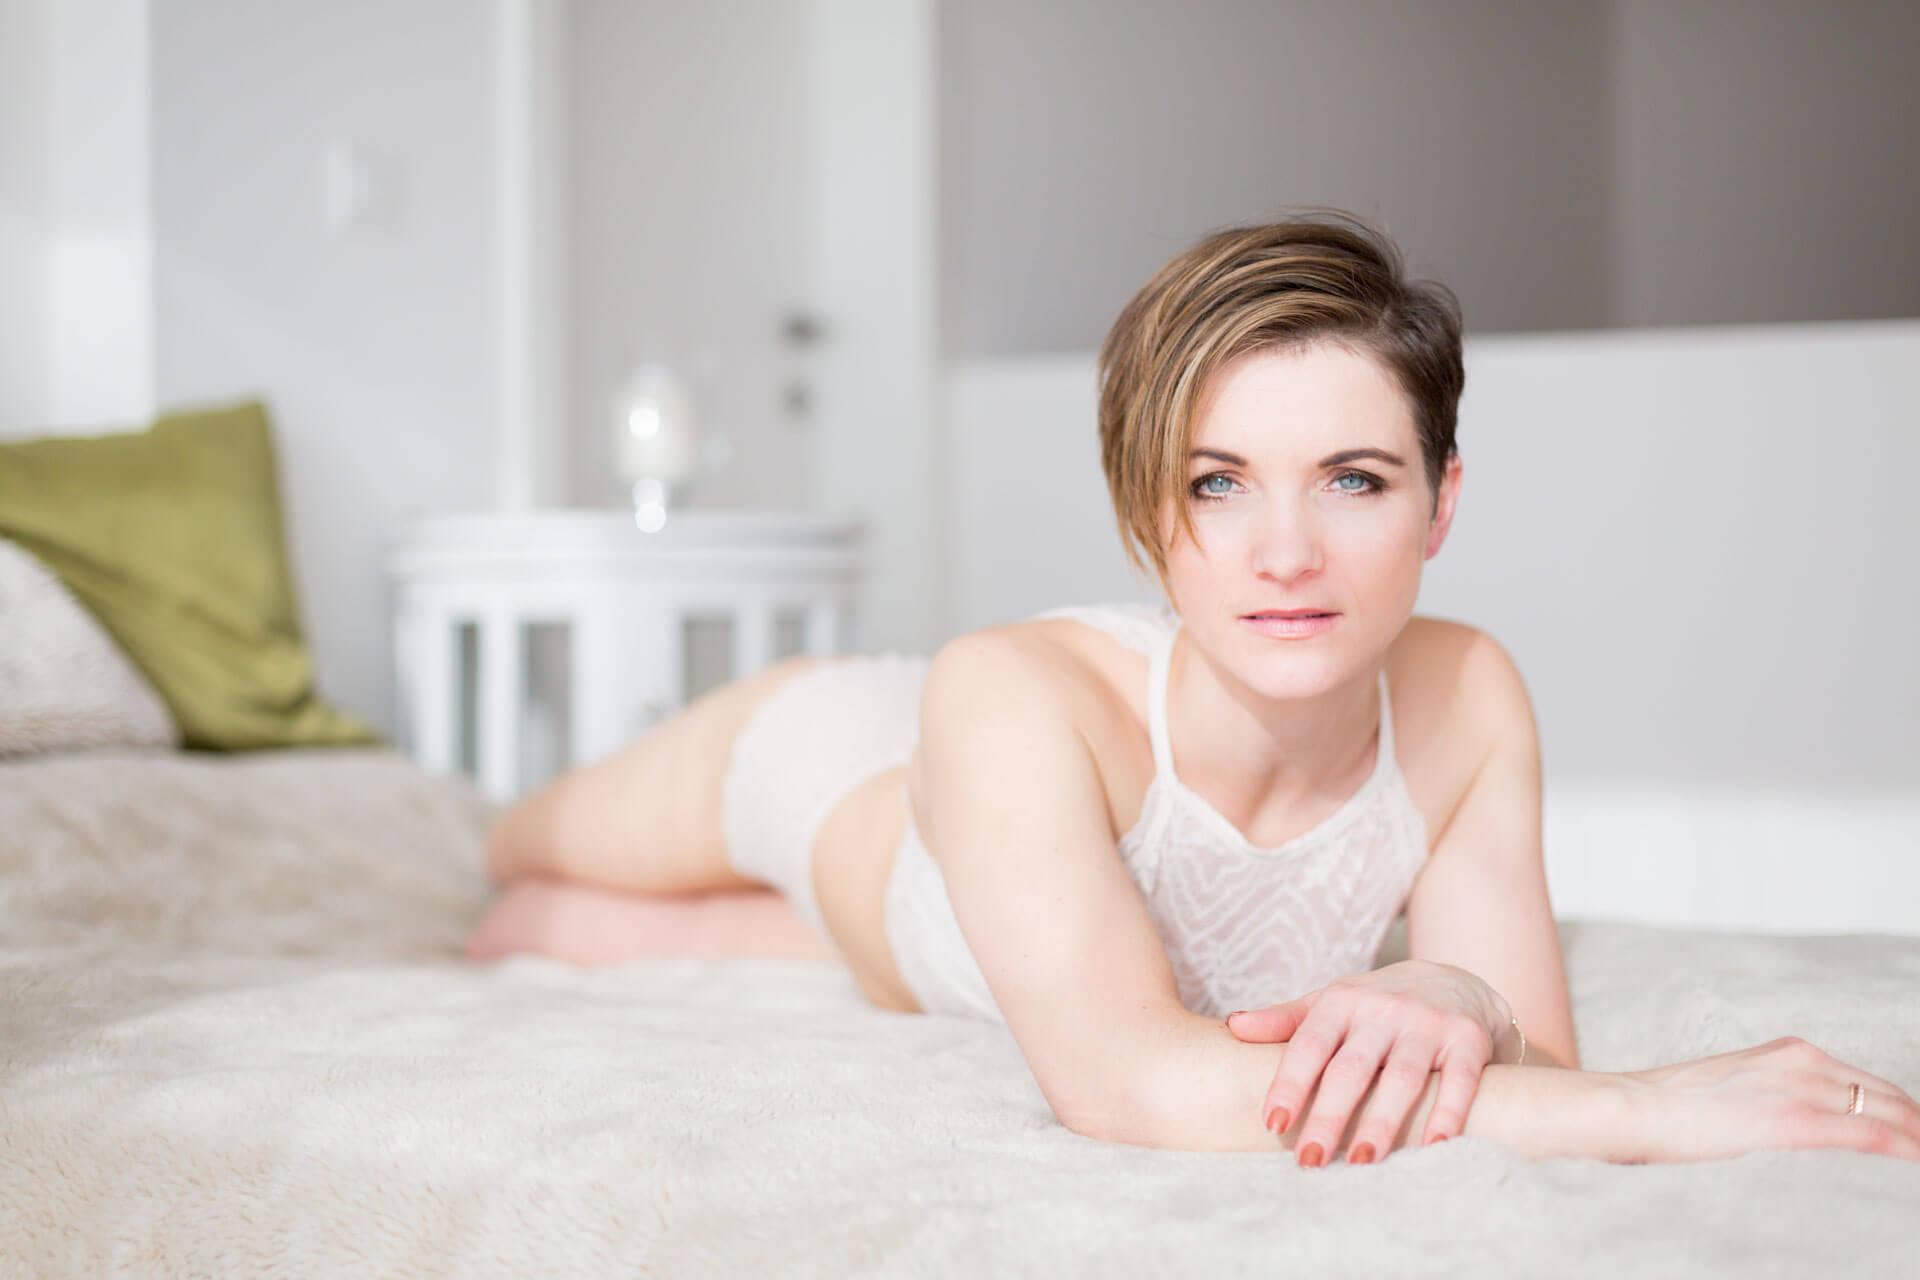 underwear photography inspiration